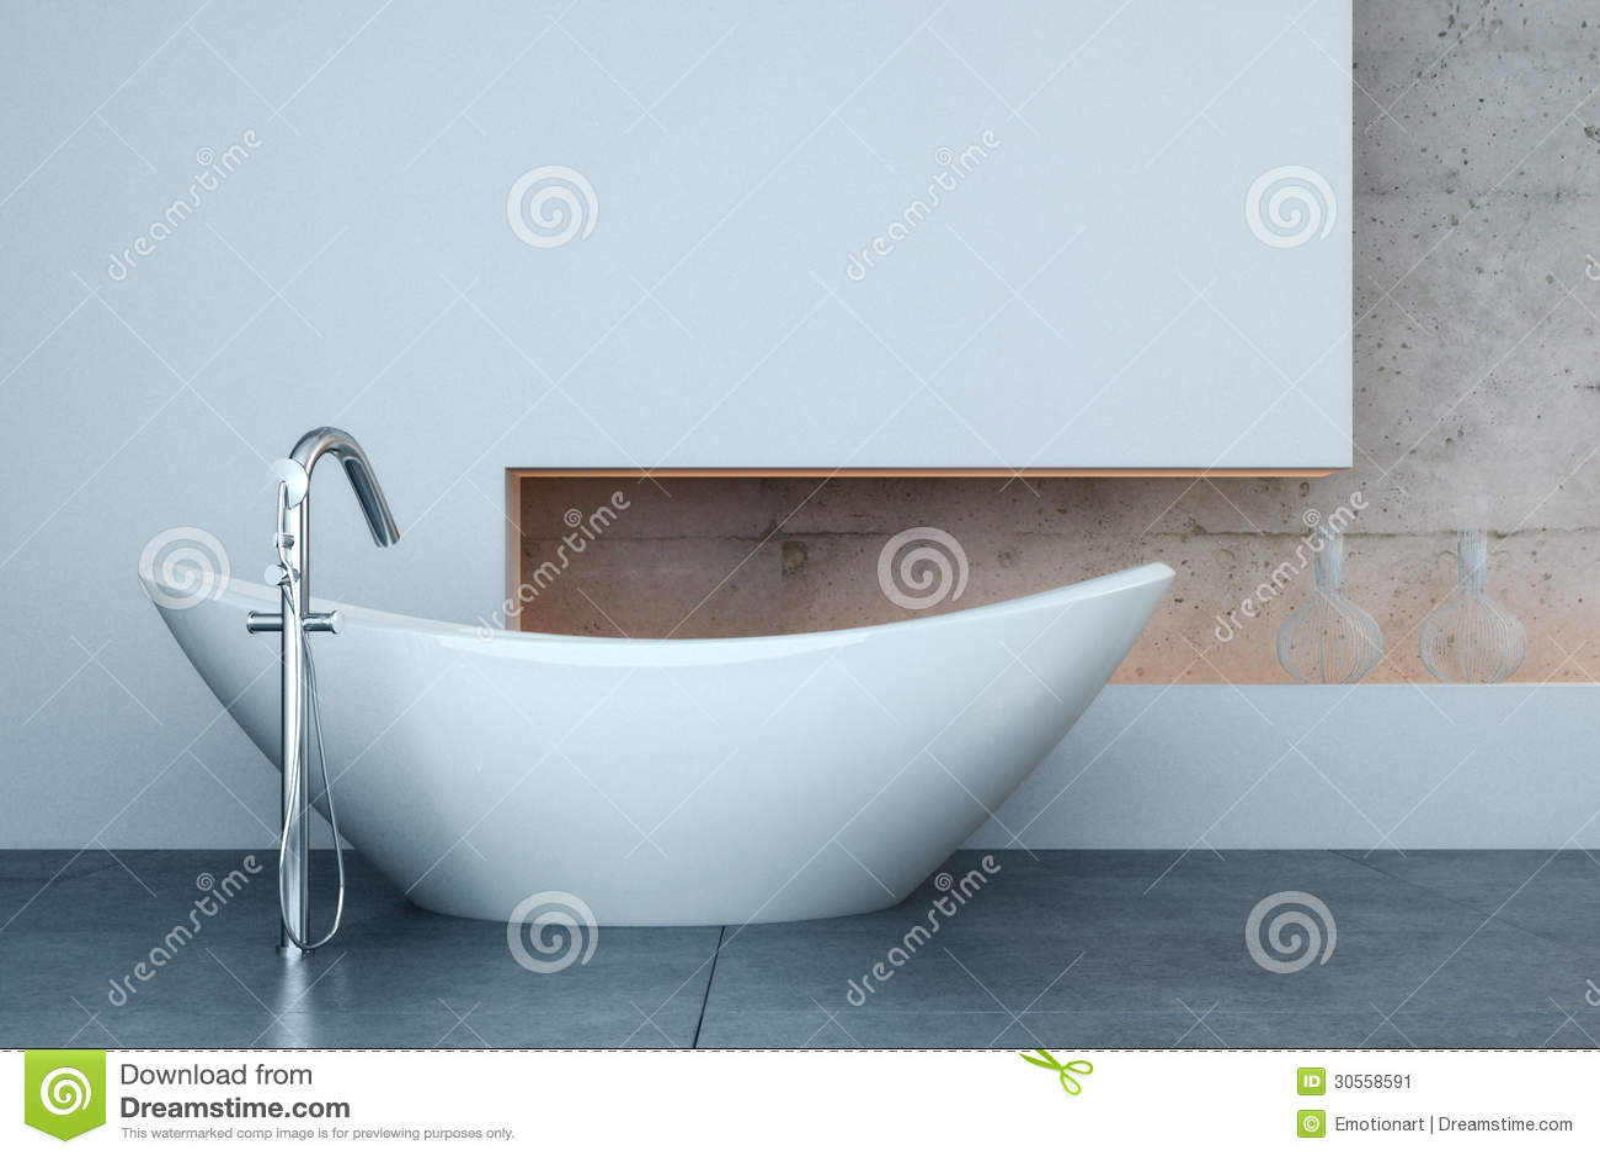 baignoire moderne devant le mur blanc image stock image. Black Bedroom Furniture Sets. Home Design Ideas